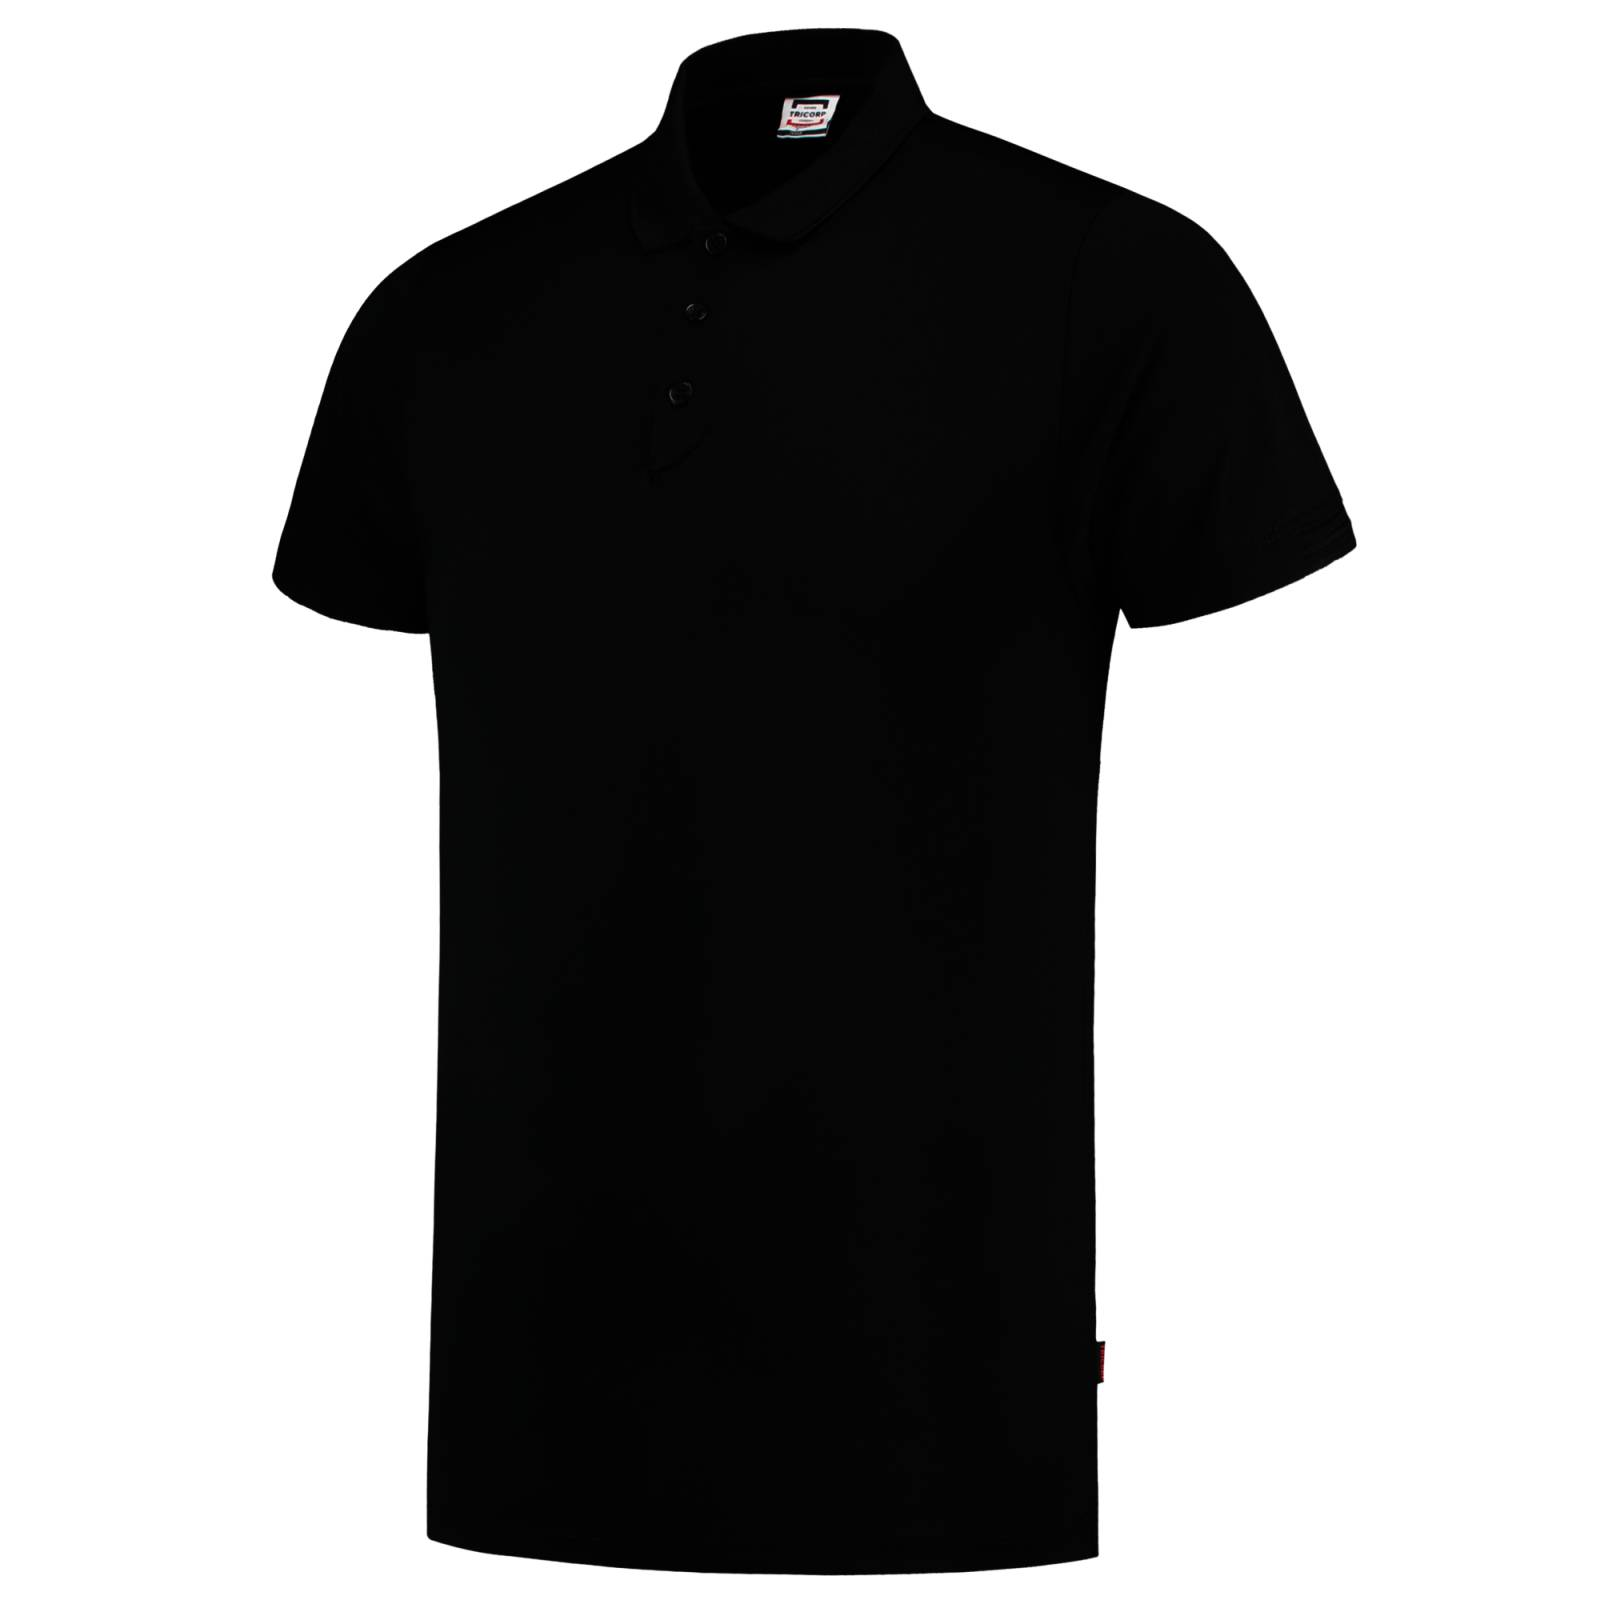 Tricorp Casual Poloshirts 201001-PBA180 zwart(Black)